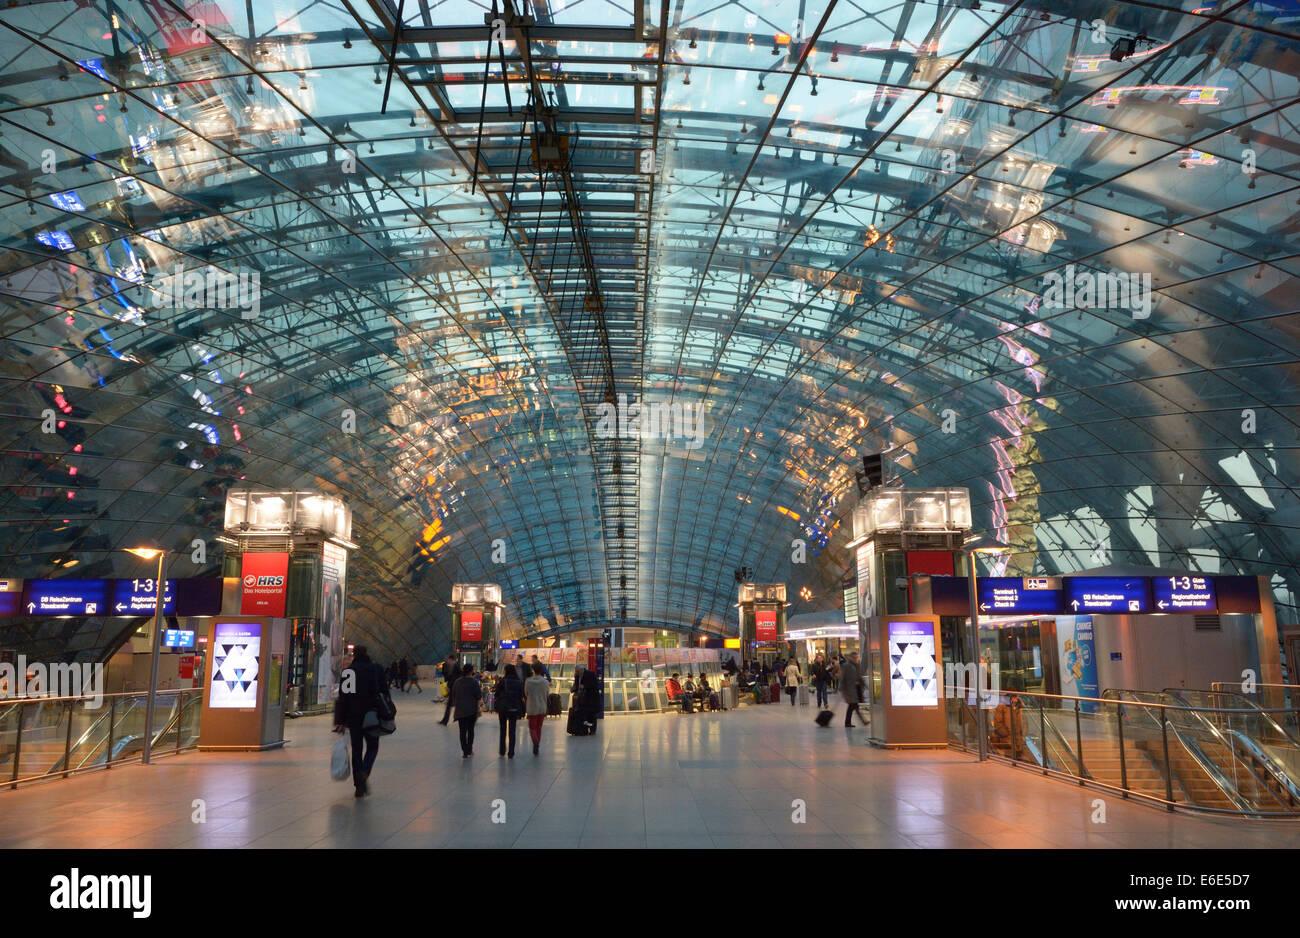 Railway station for long-distance trains at Frankfurt am Main Airport, Frankfurt am Main, Hesse, Germany - Stock Image